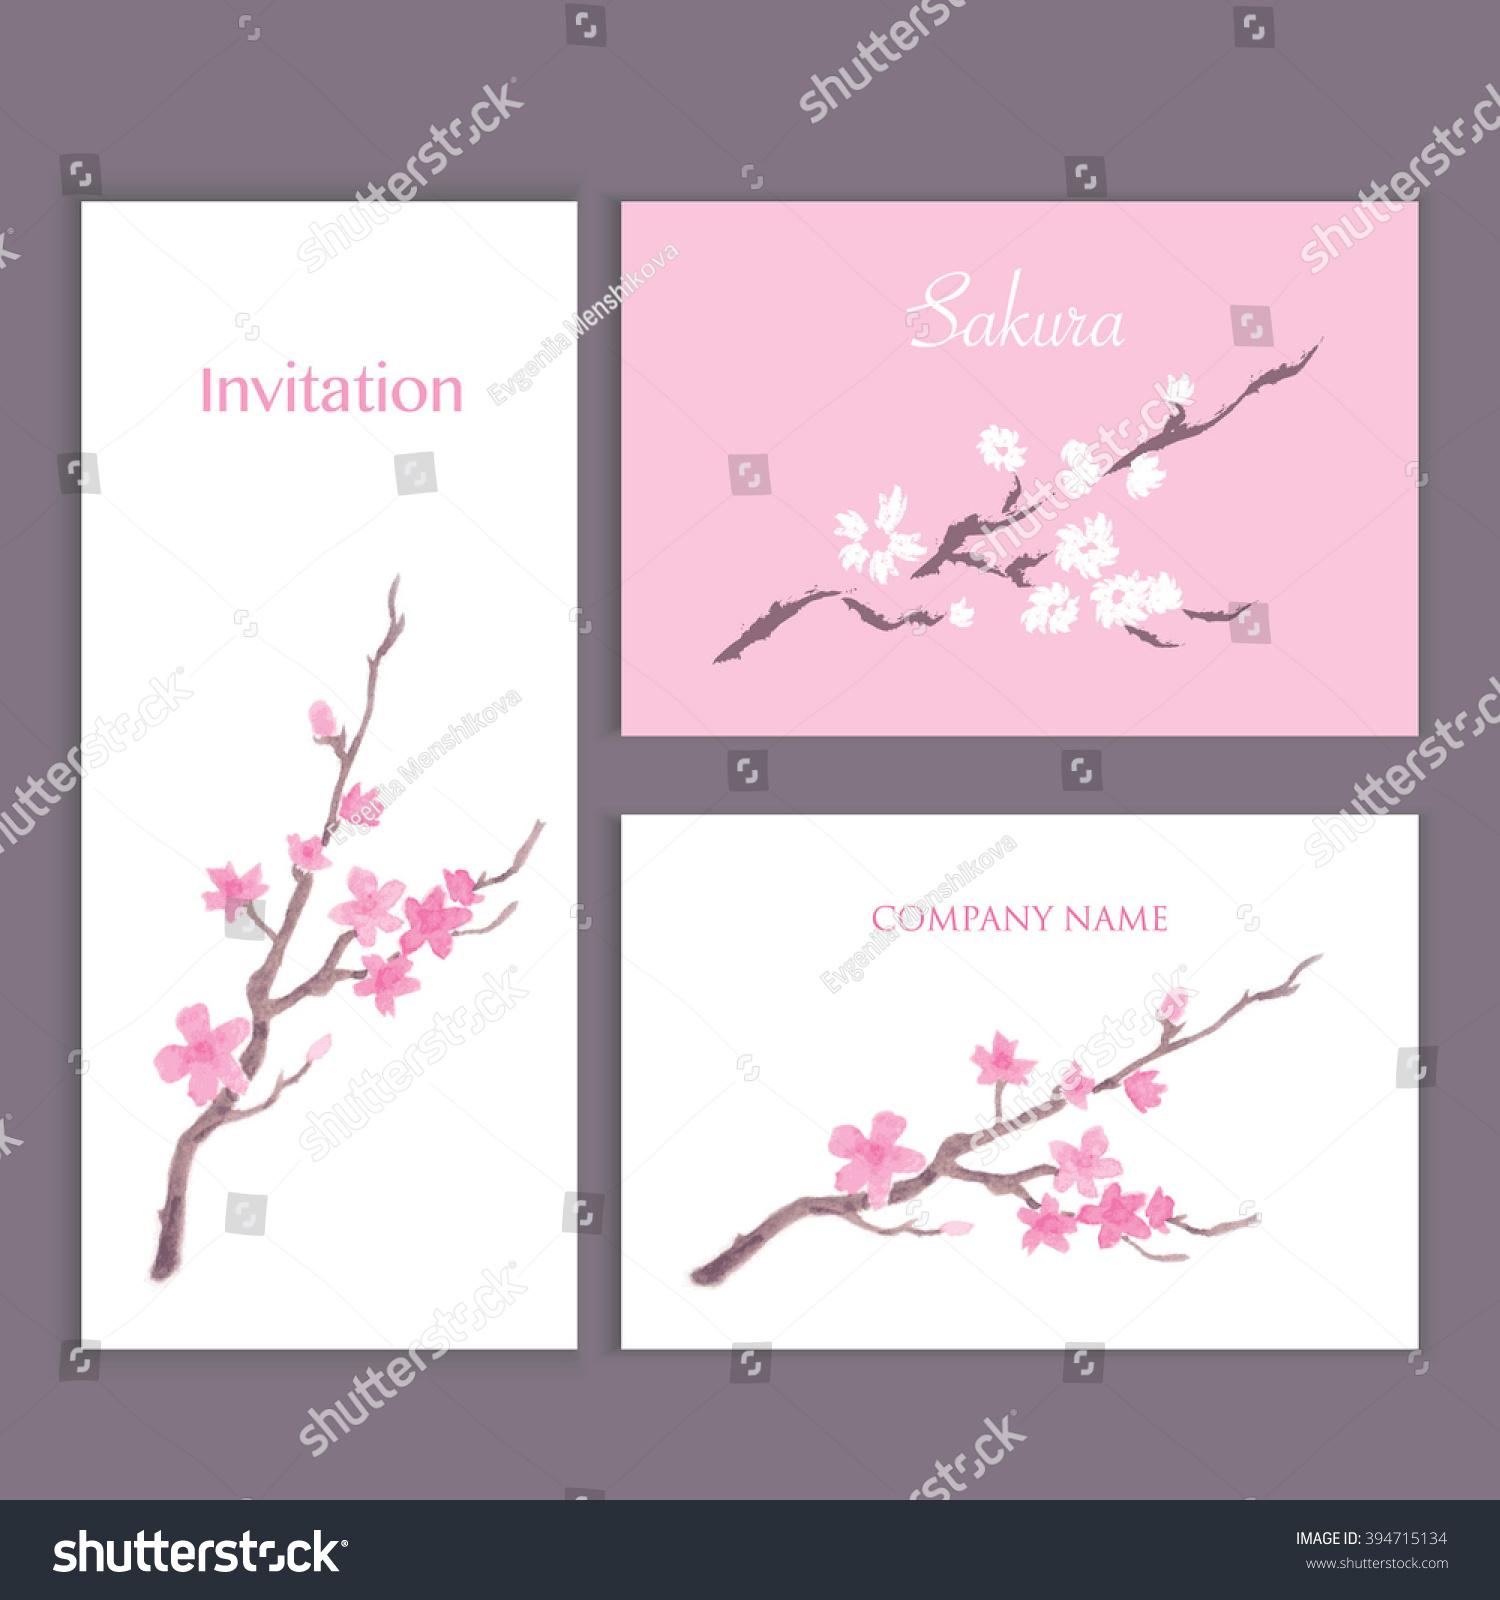 Invitation Business Cards Blossom Sakura Your Stock Vector 394715134 ...